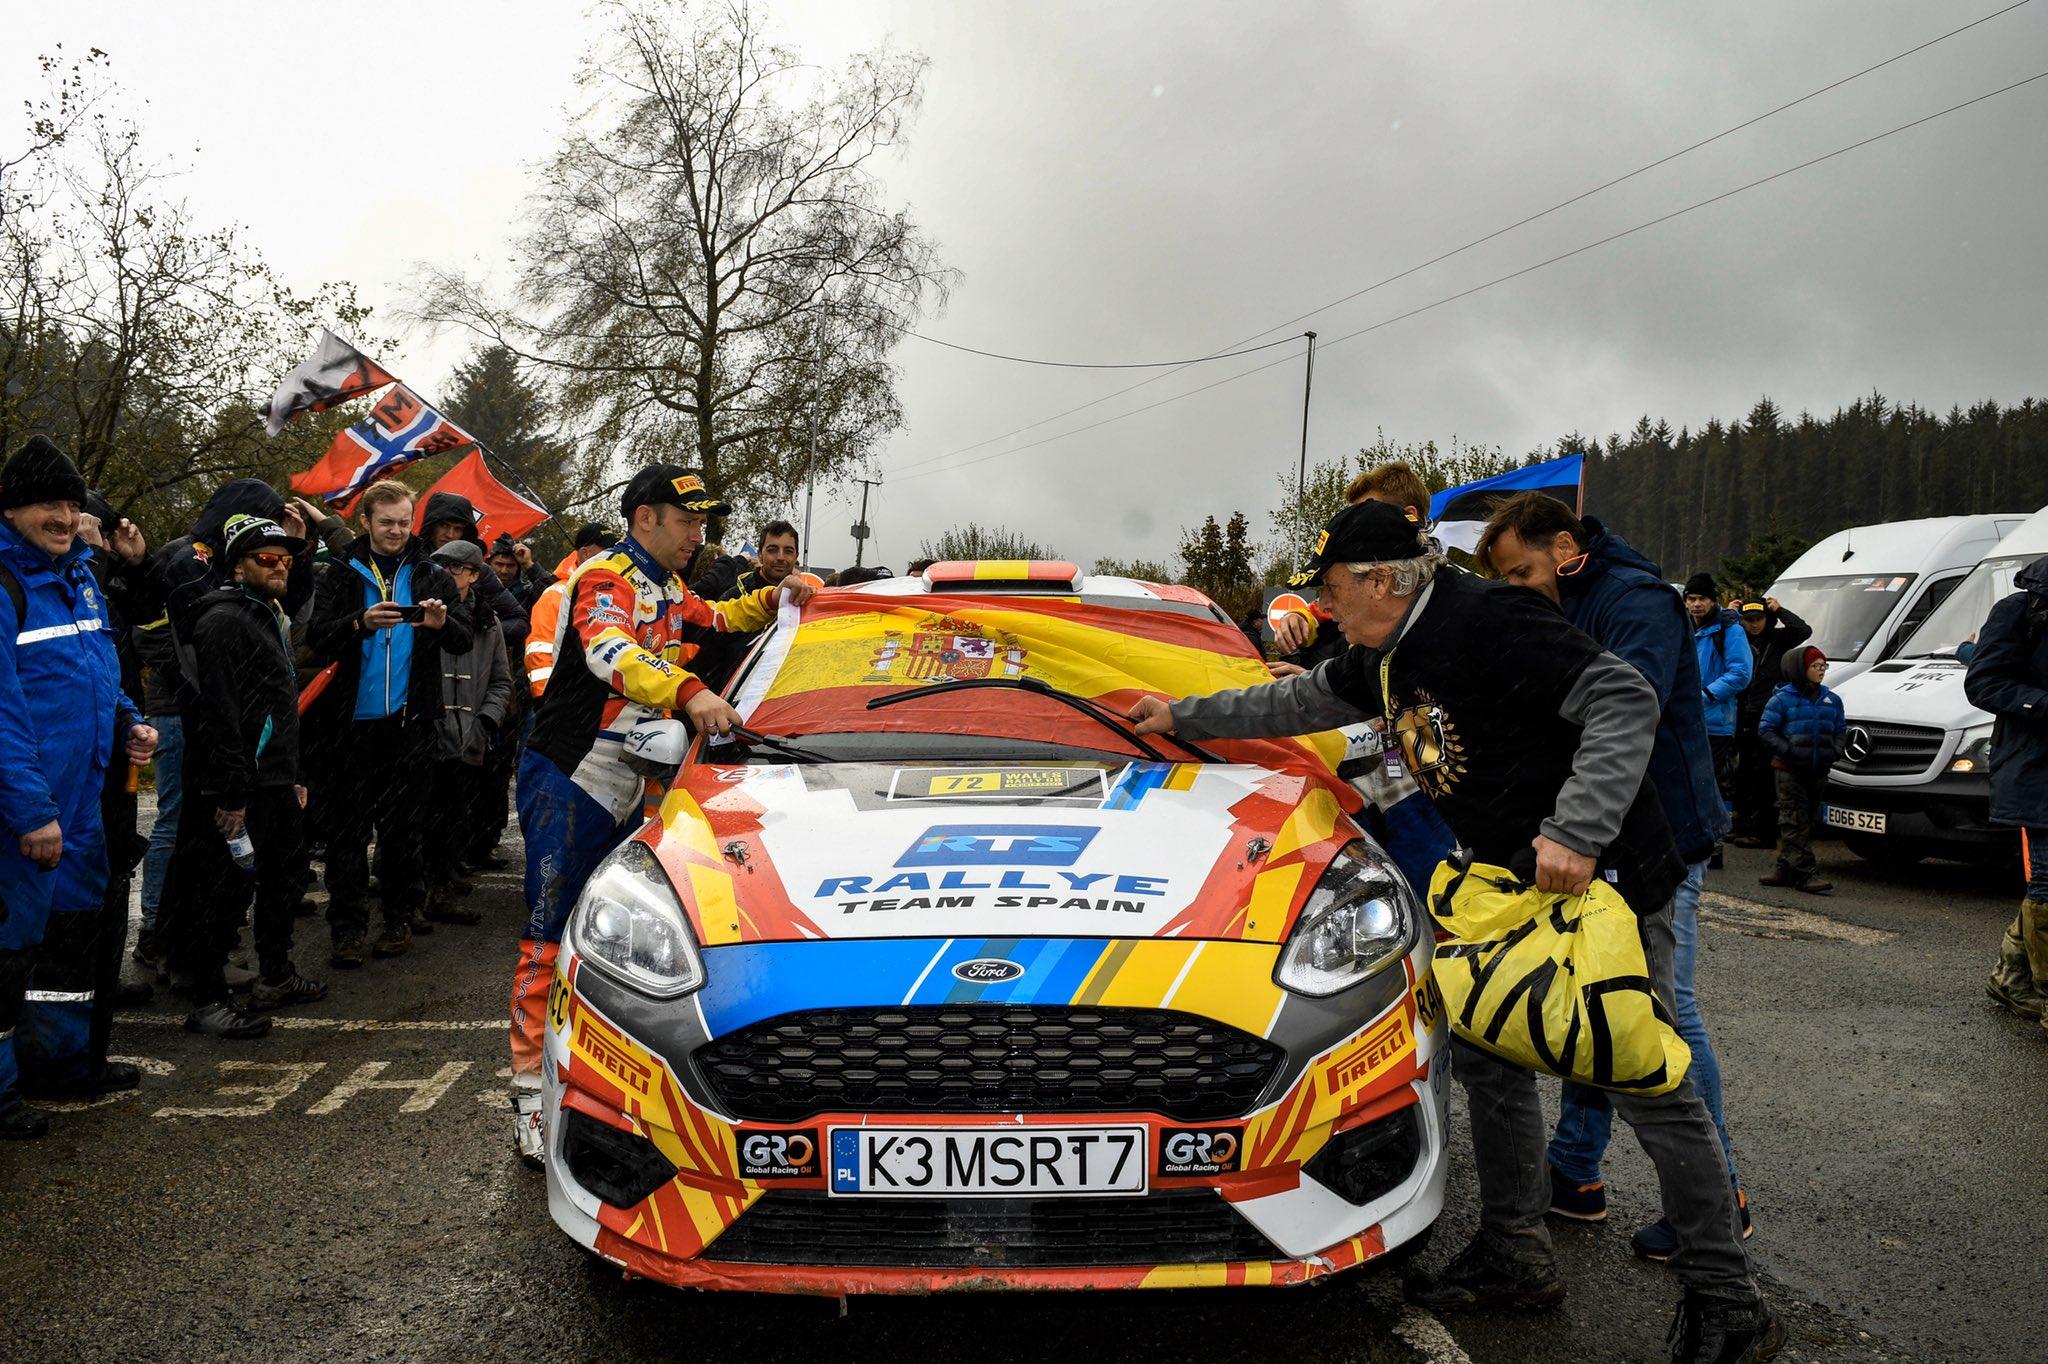 WRC: Wales Rallye GB [3-6 Octubre] - Página 6 EGMjsyOX0AABfKo?format=jpg&name=4096x4096